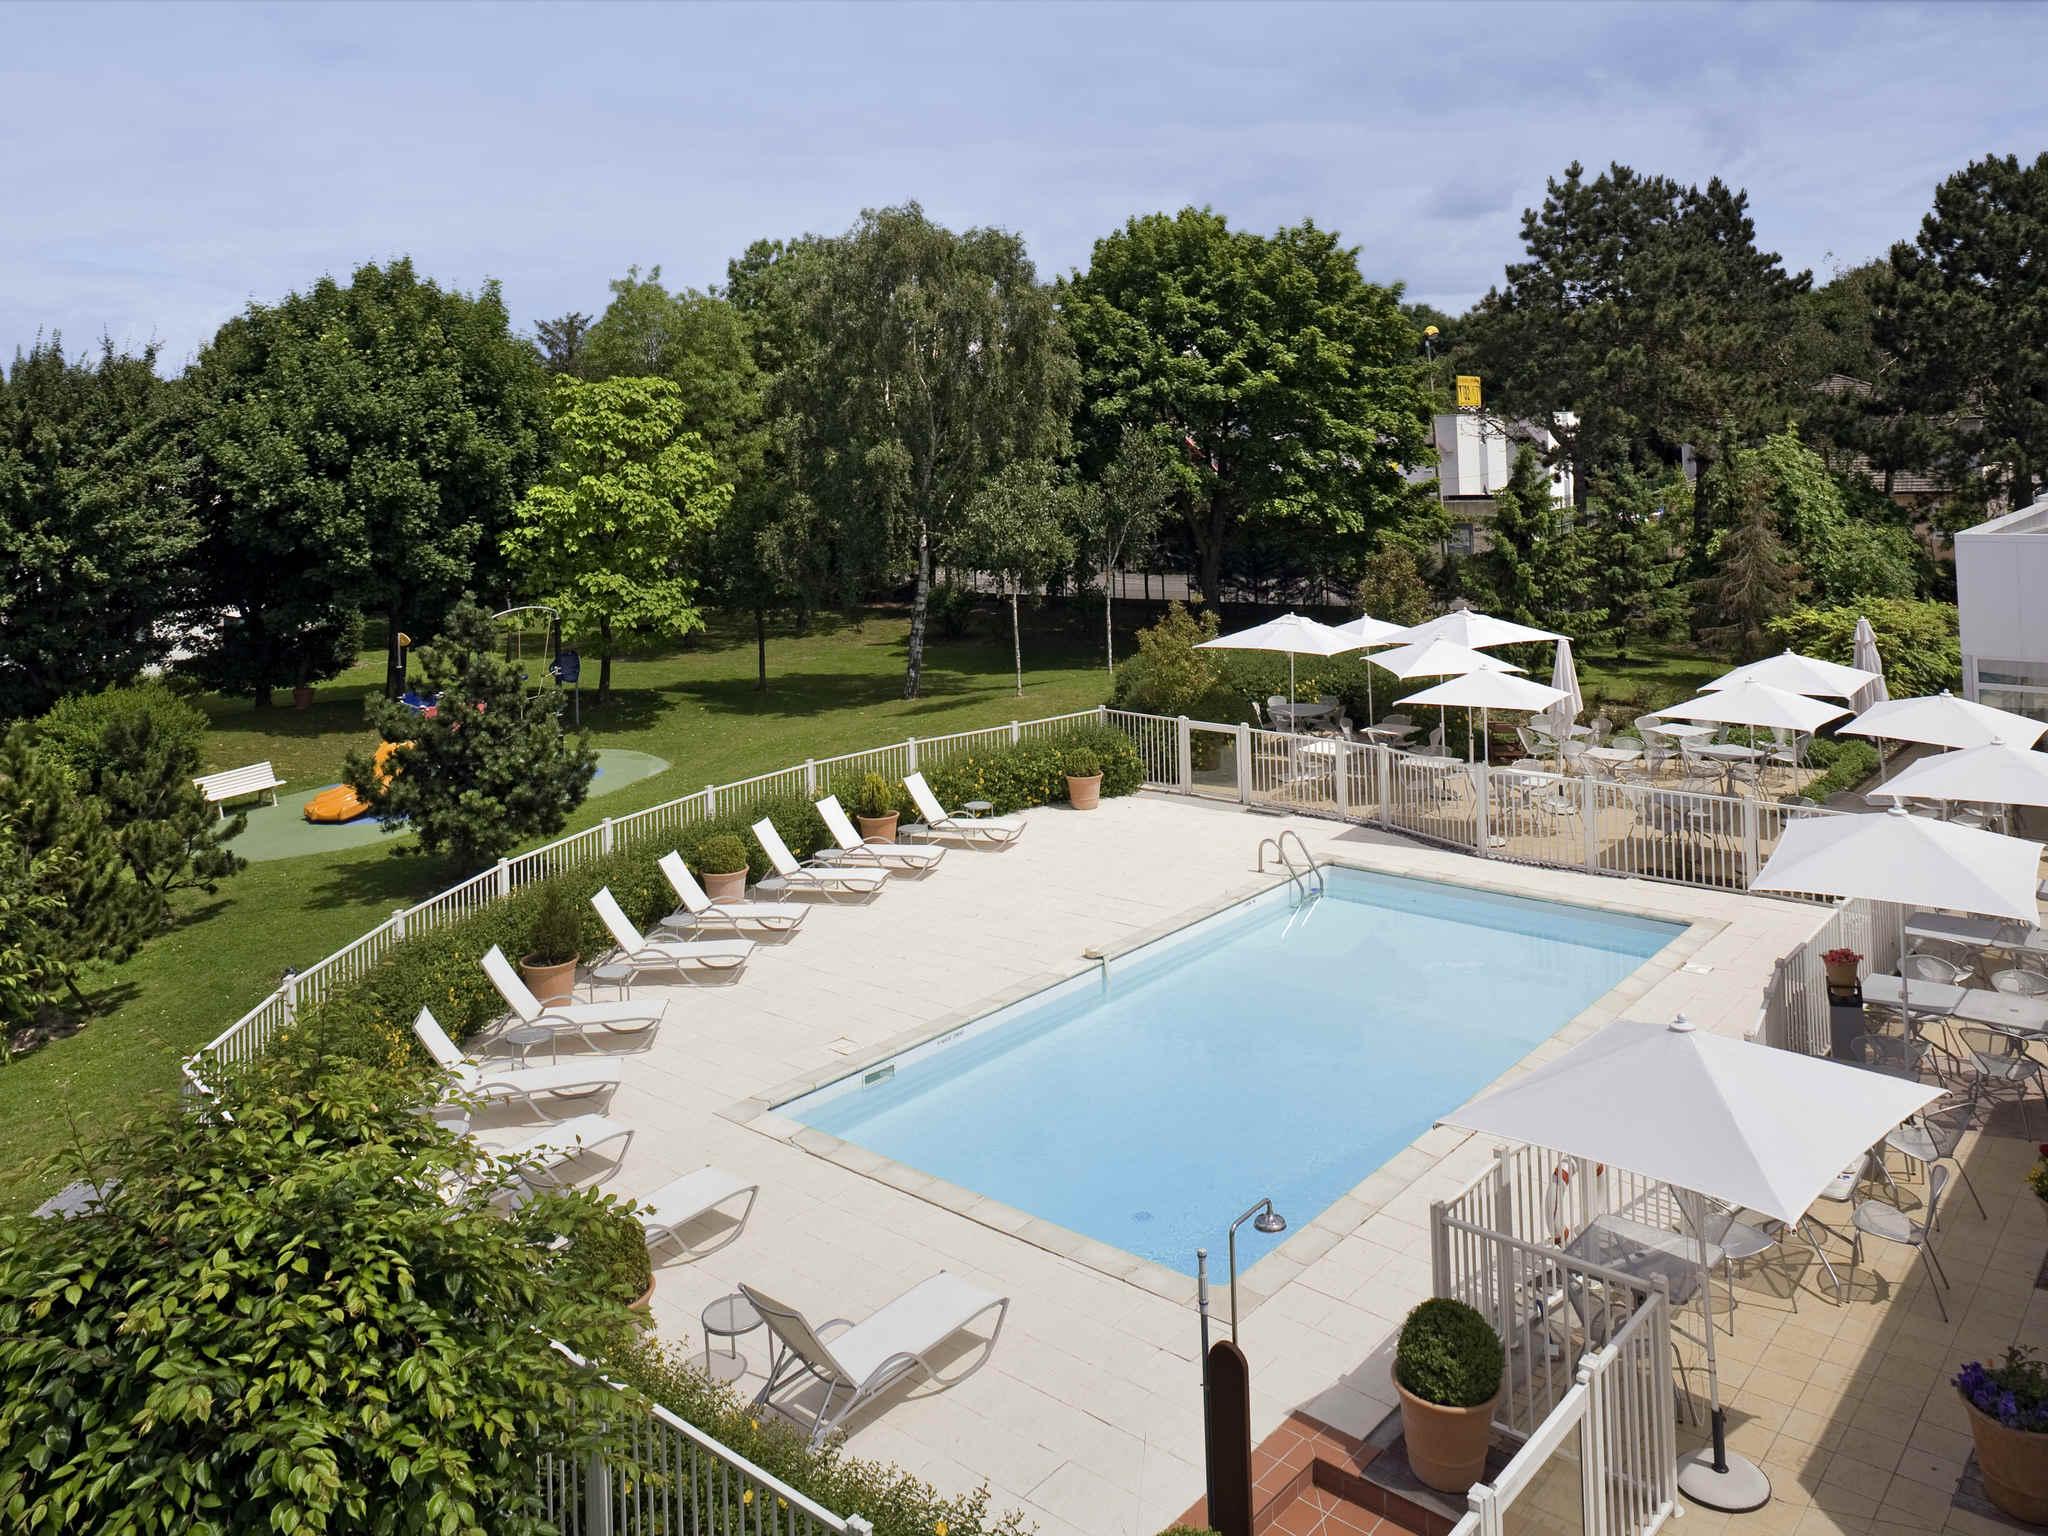 Hotel di novotel amiens p le jules verne novotel amiens - Piscine jules verne tarif ...